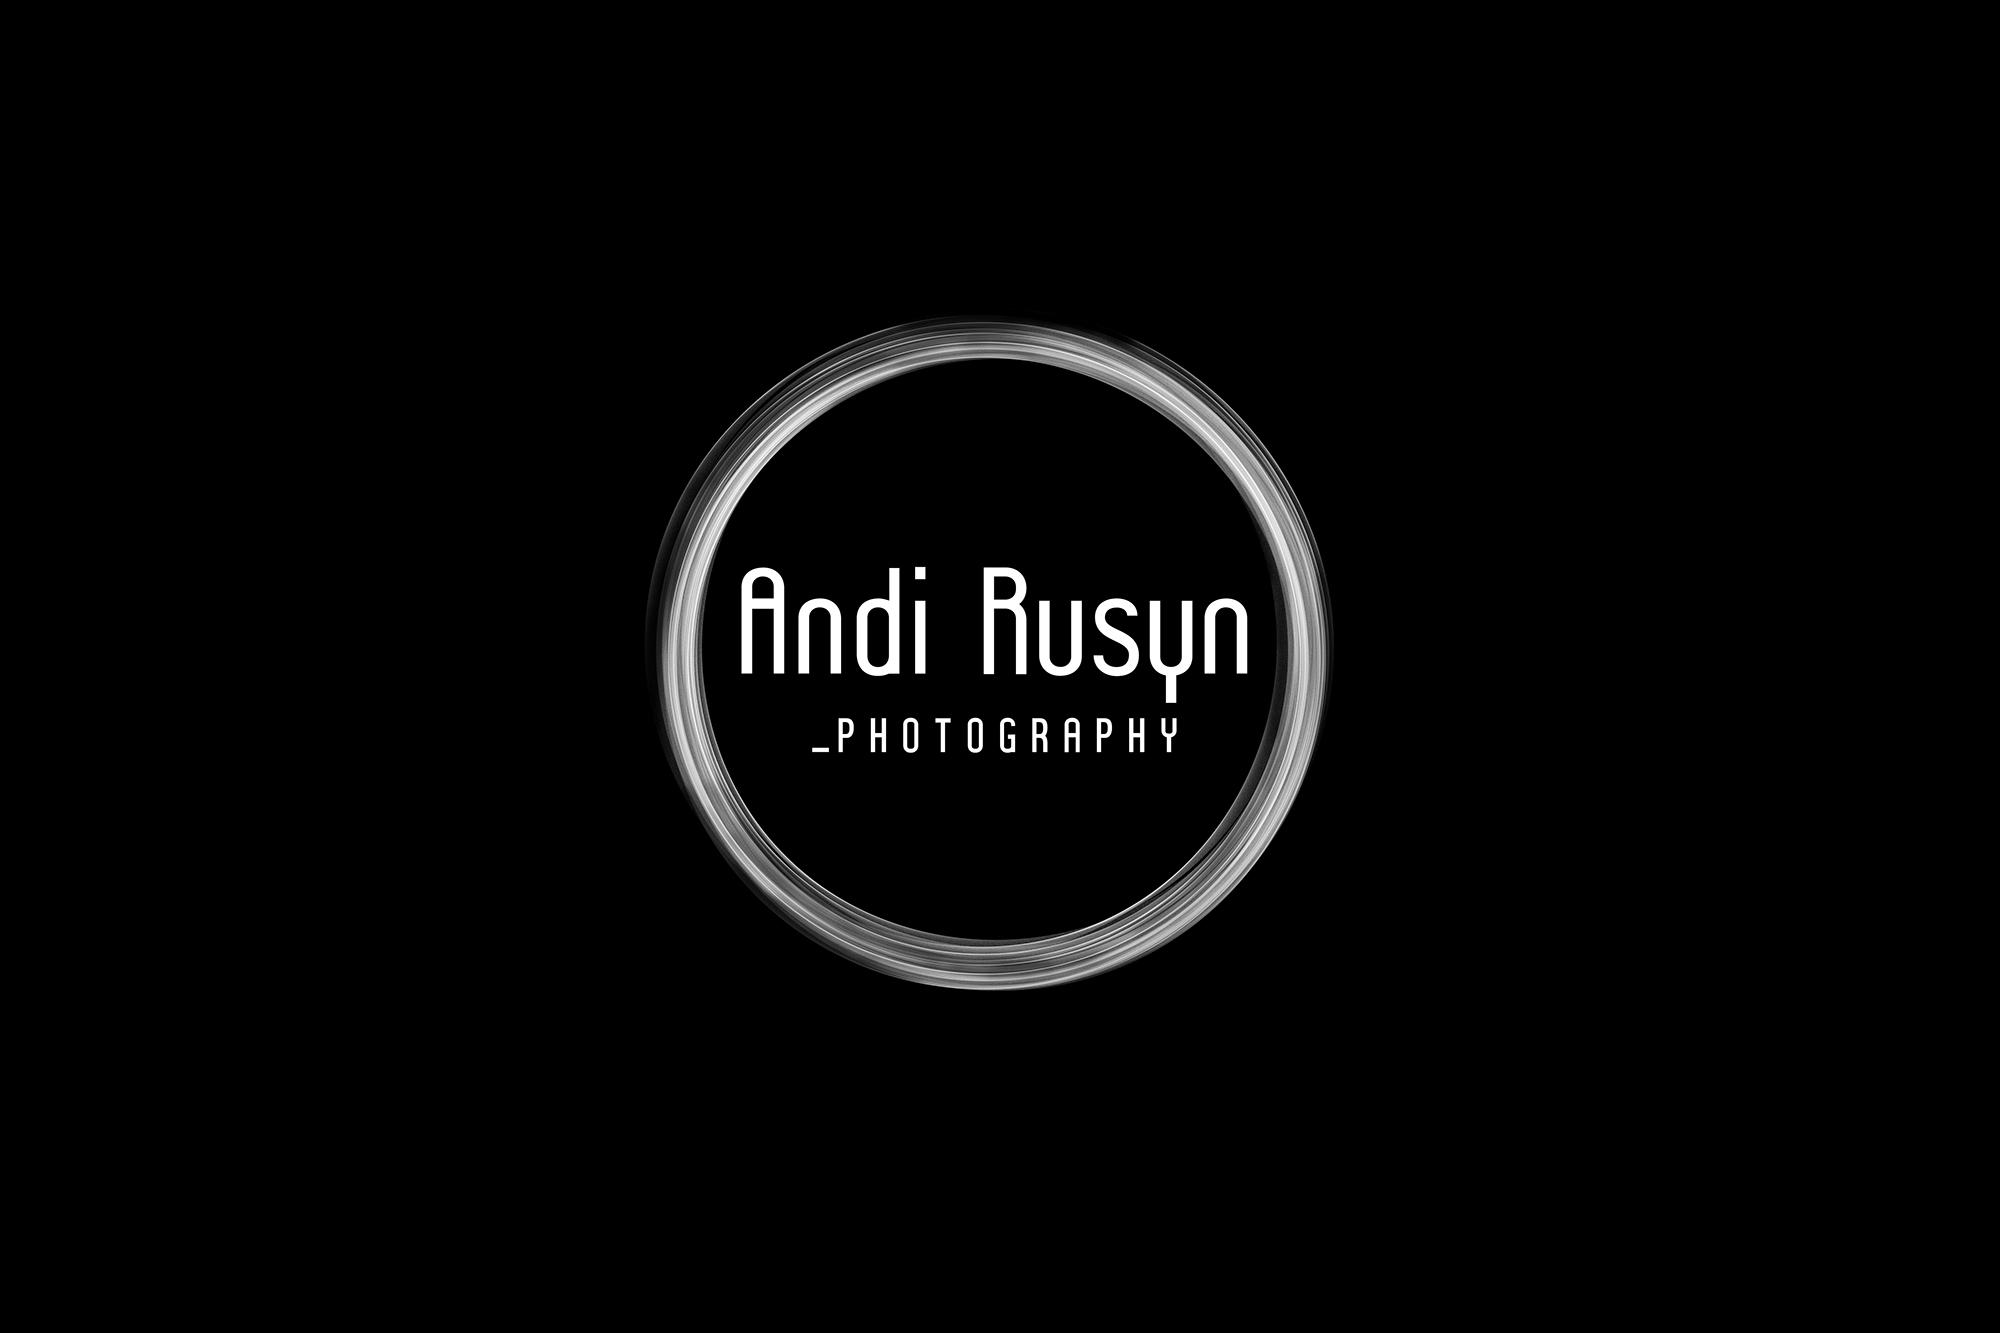 http://rusyndesign.co.uk/wp-content/uploads/2020/04/UWR-19-book-shots-28.jpg